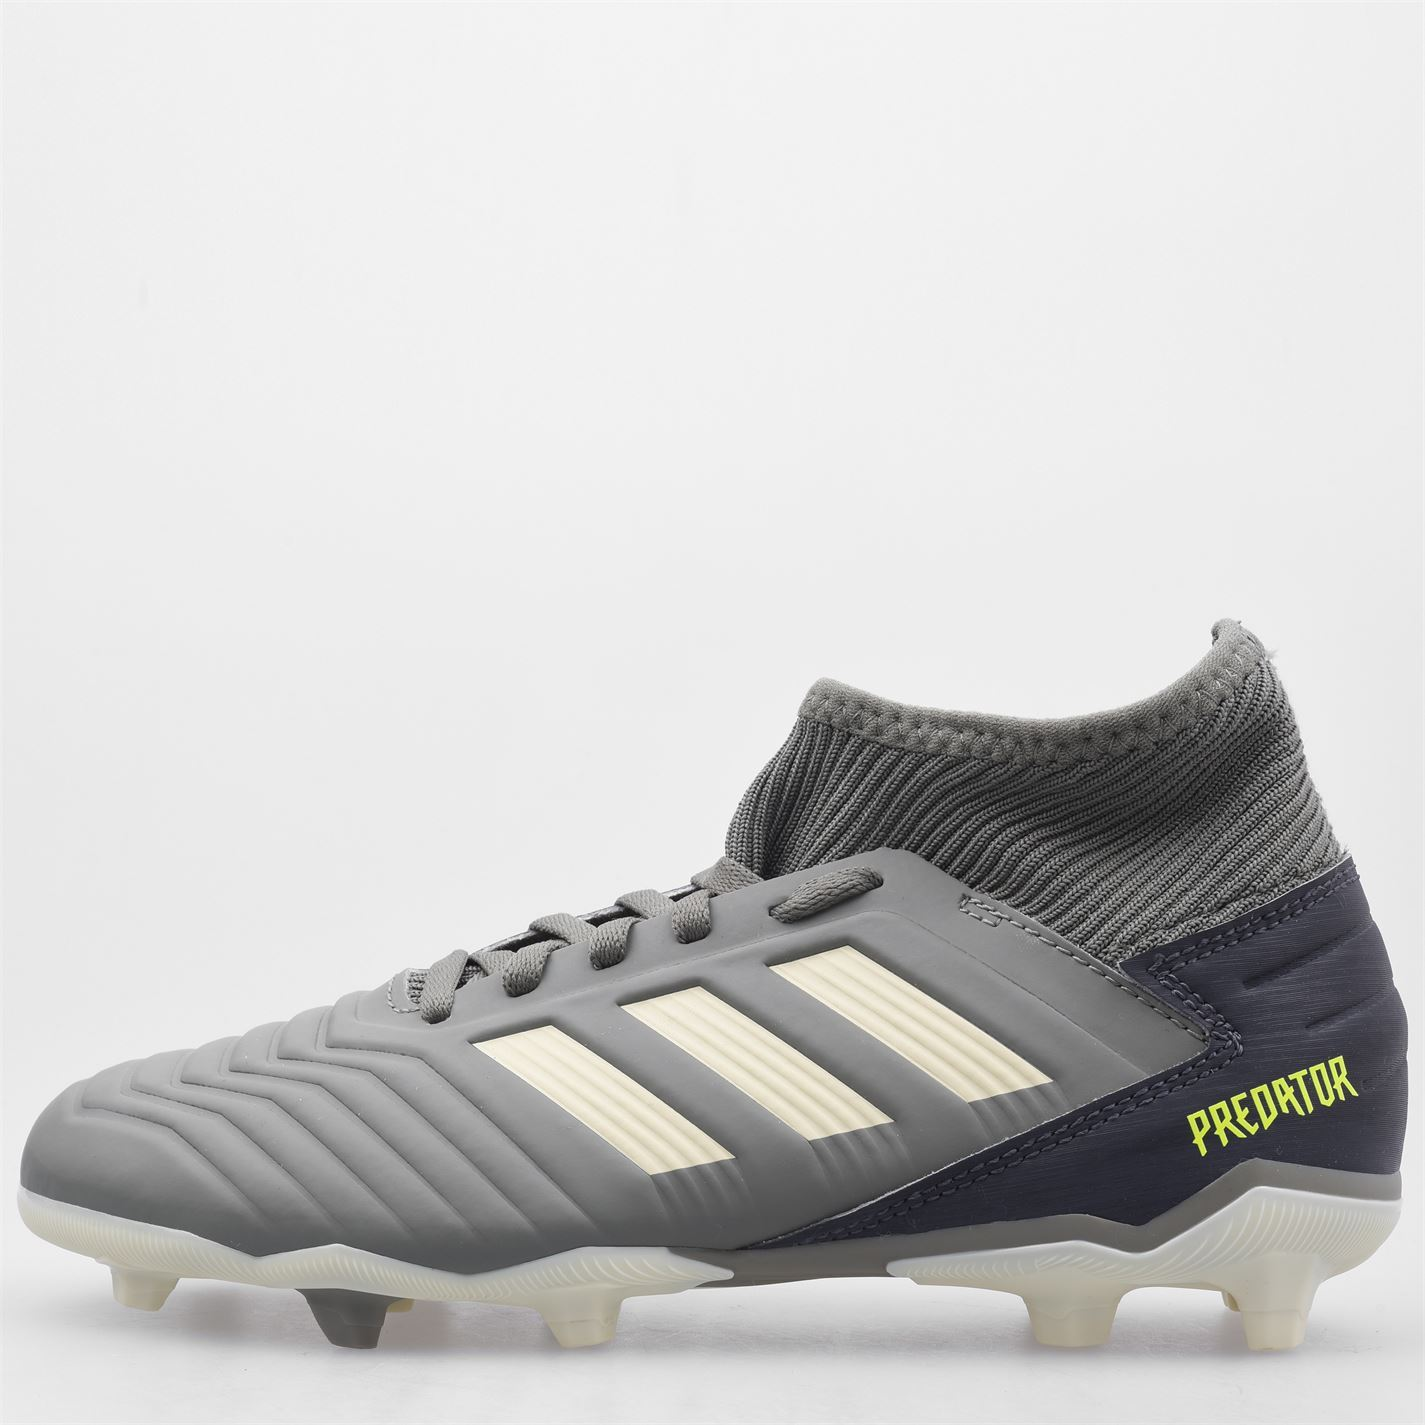 Adidas-Predator-Junior-19-3-FG-Firm-Ground-football-boots-Boys-Football-Chaussures miniature 10